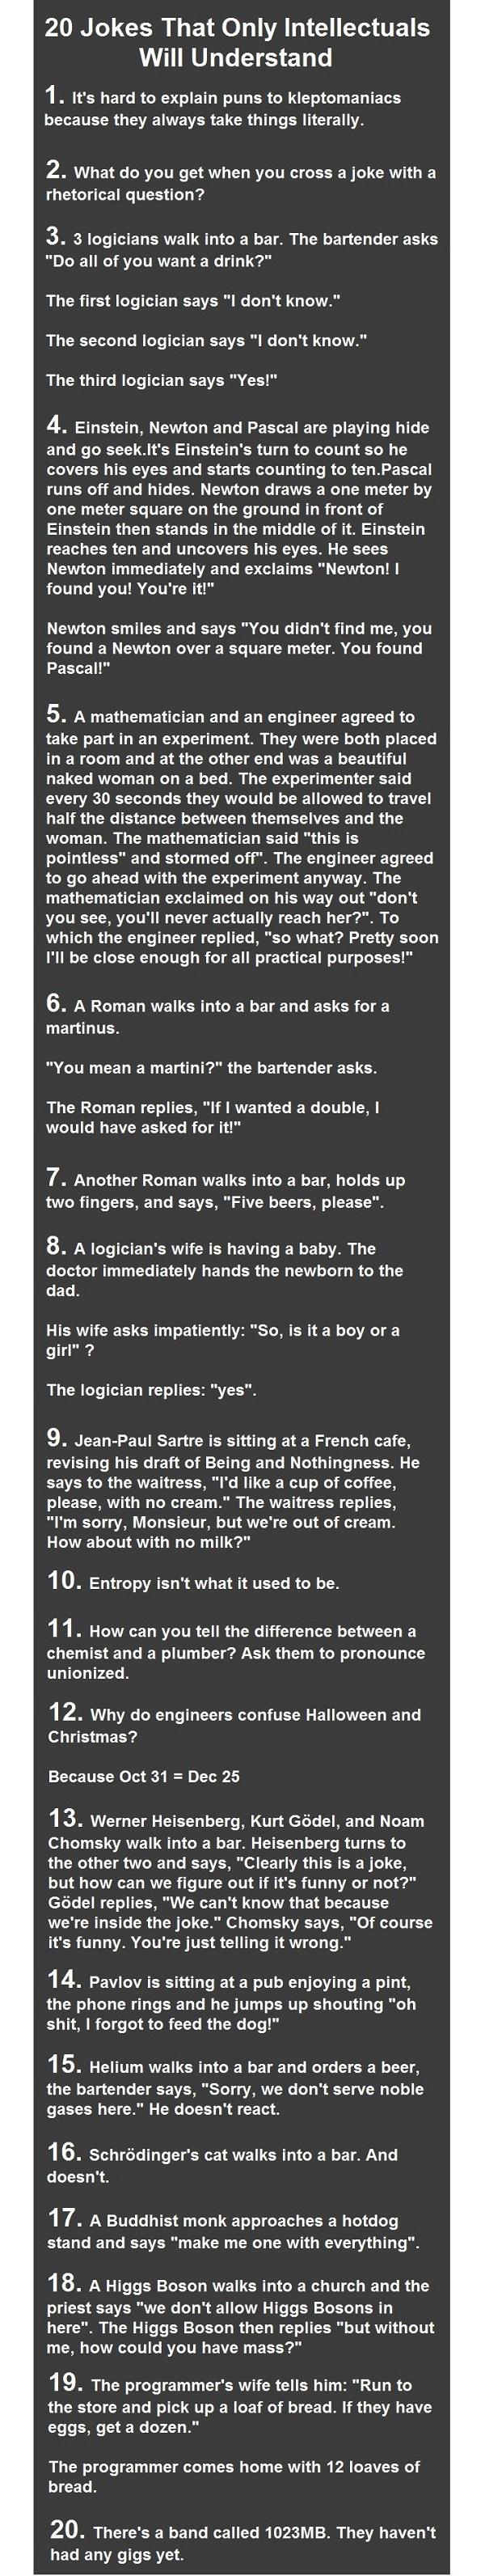 20 jokes that only intellectuals will understand...